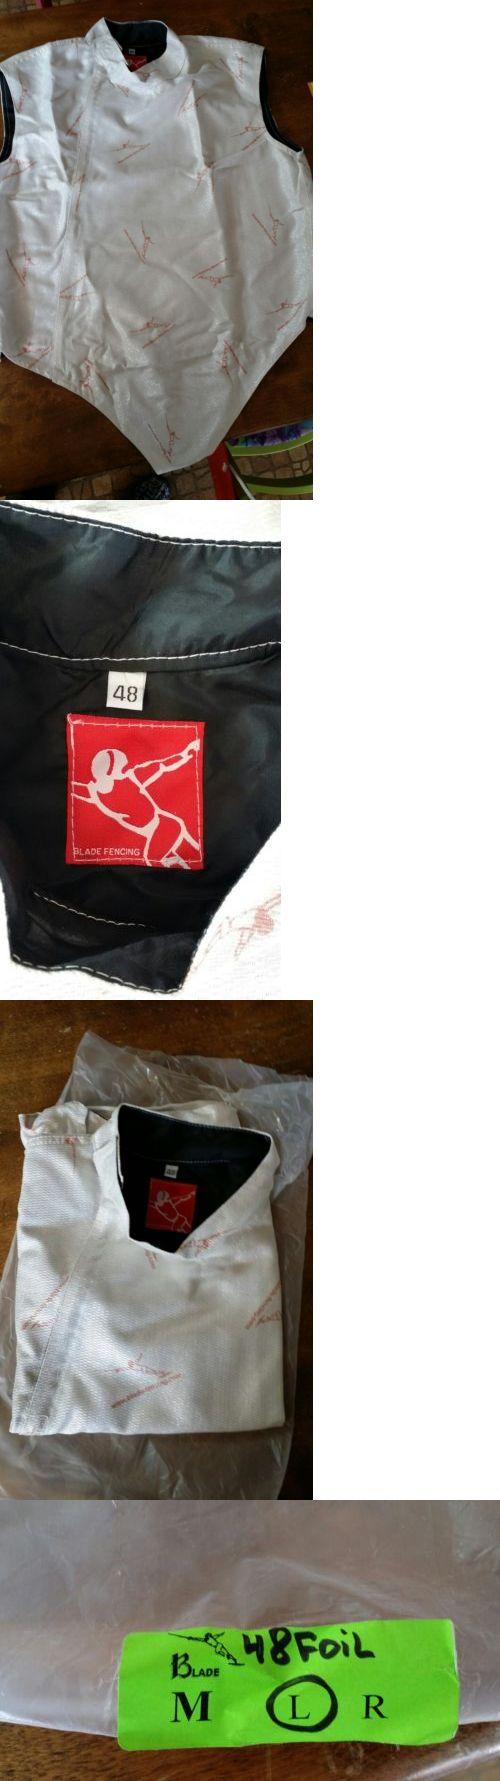 Fencing 47322: Blade Foil Lame For Left Handed Men Size 48 -> BUY IT NOW ONLY: $49.0 on eBay!